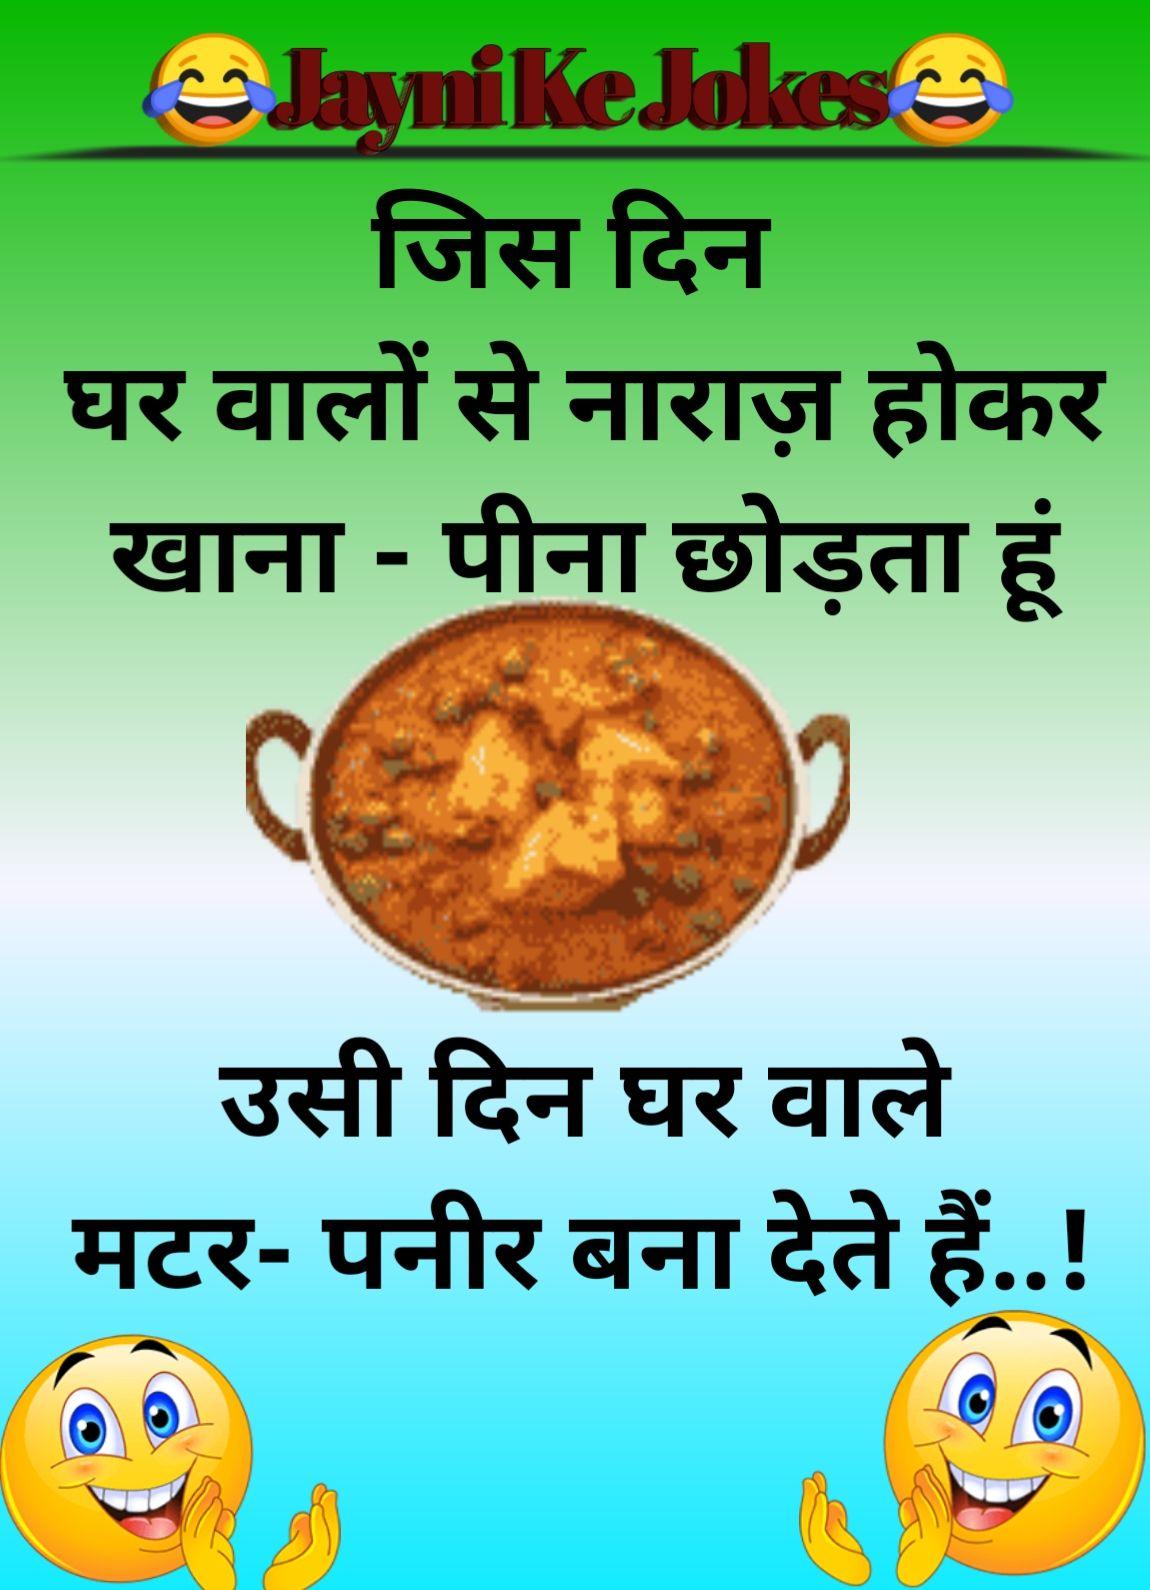 Pin By Shyam Sunani On Jokes Images In 2020 Jokes Images Jokes Food